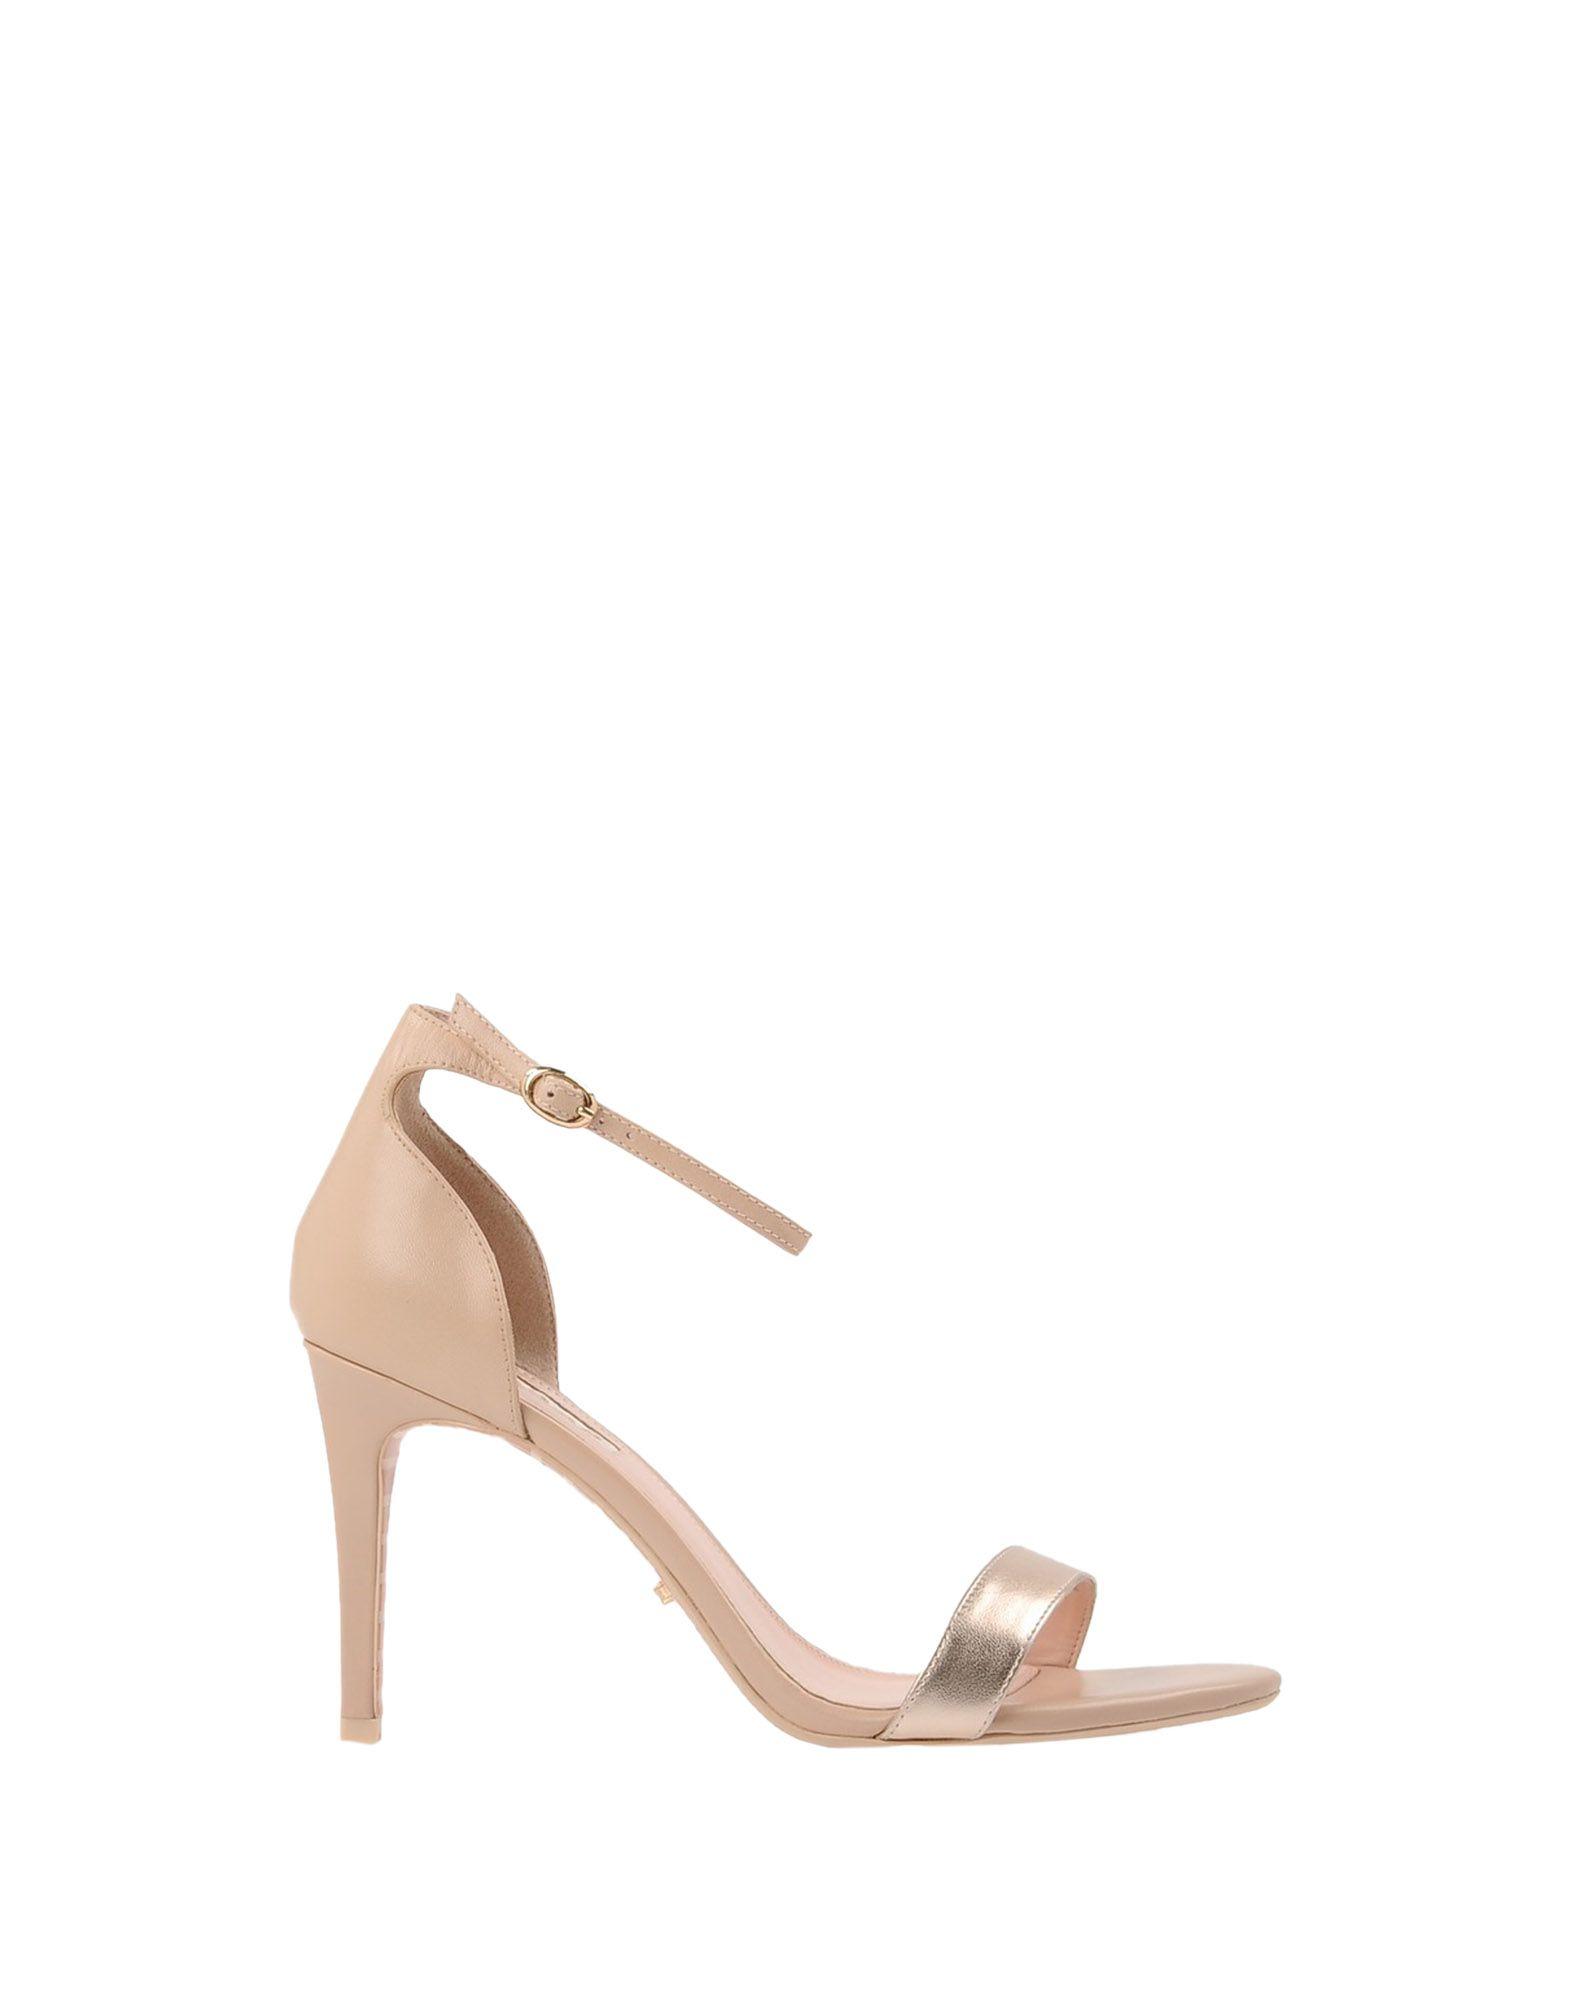 Dune London Sandal 2 Part Sandal London  11441922BC Gute Qualität beliebte Schuhe 327d32